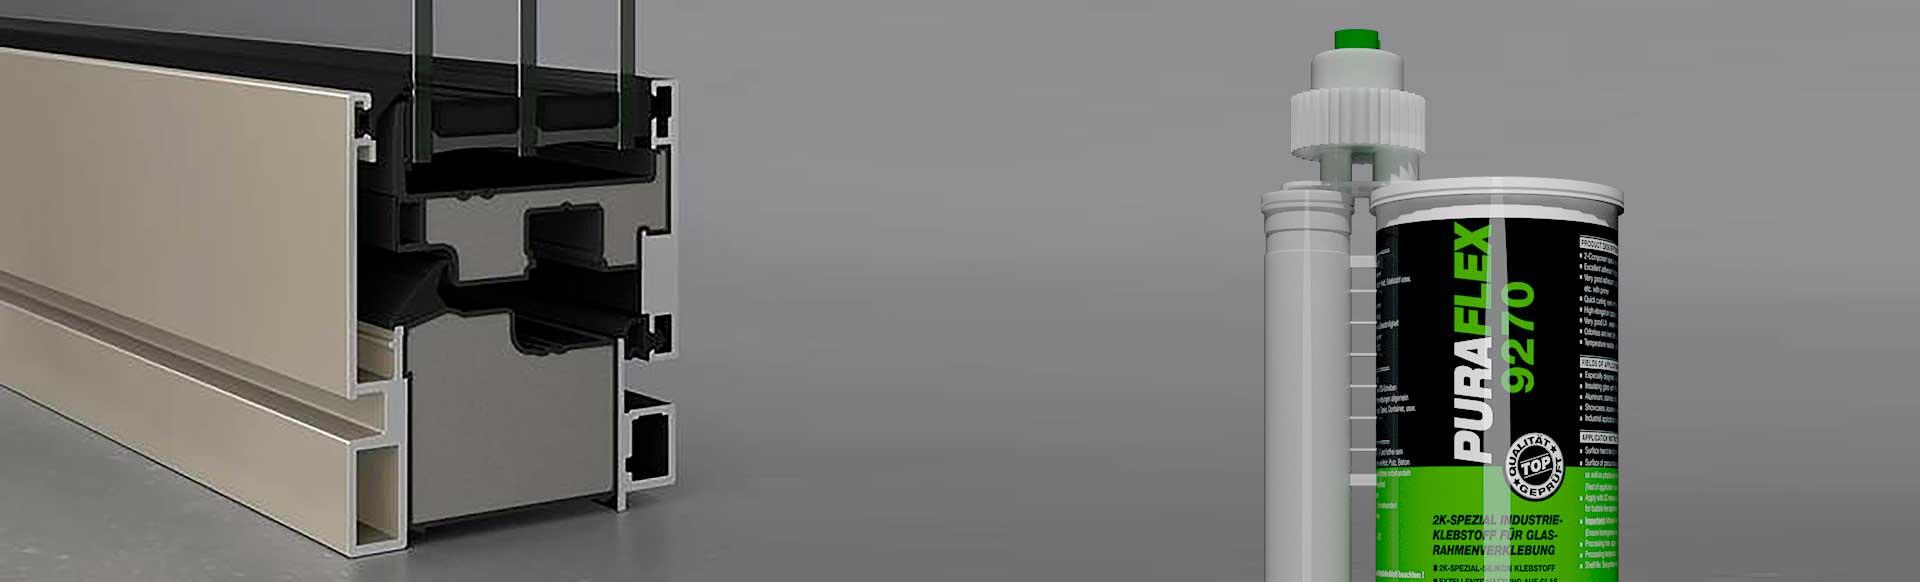 Вклеивание стеклопакетов клеем PURAFLEX® 9270 в окна и двери из алюминия